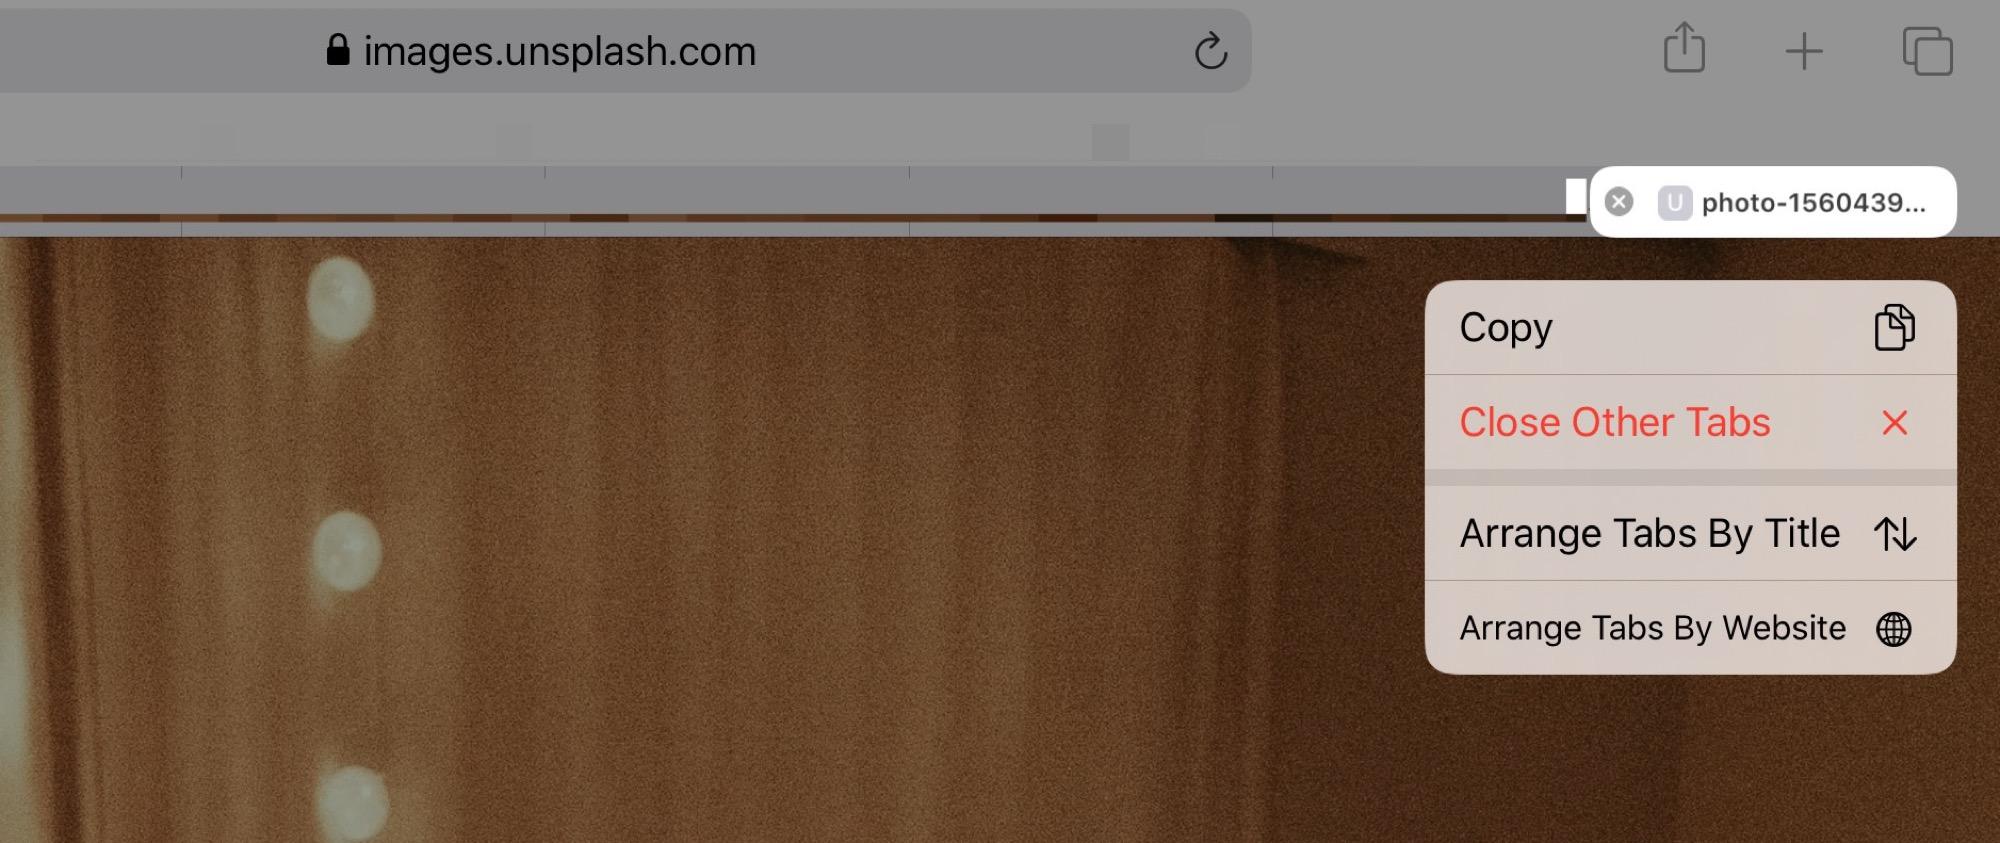 The new Safari tab menu in iOS 13.